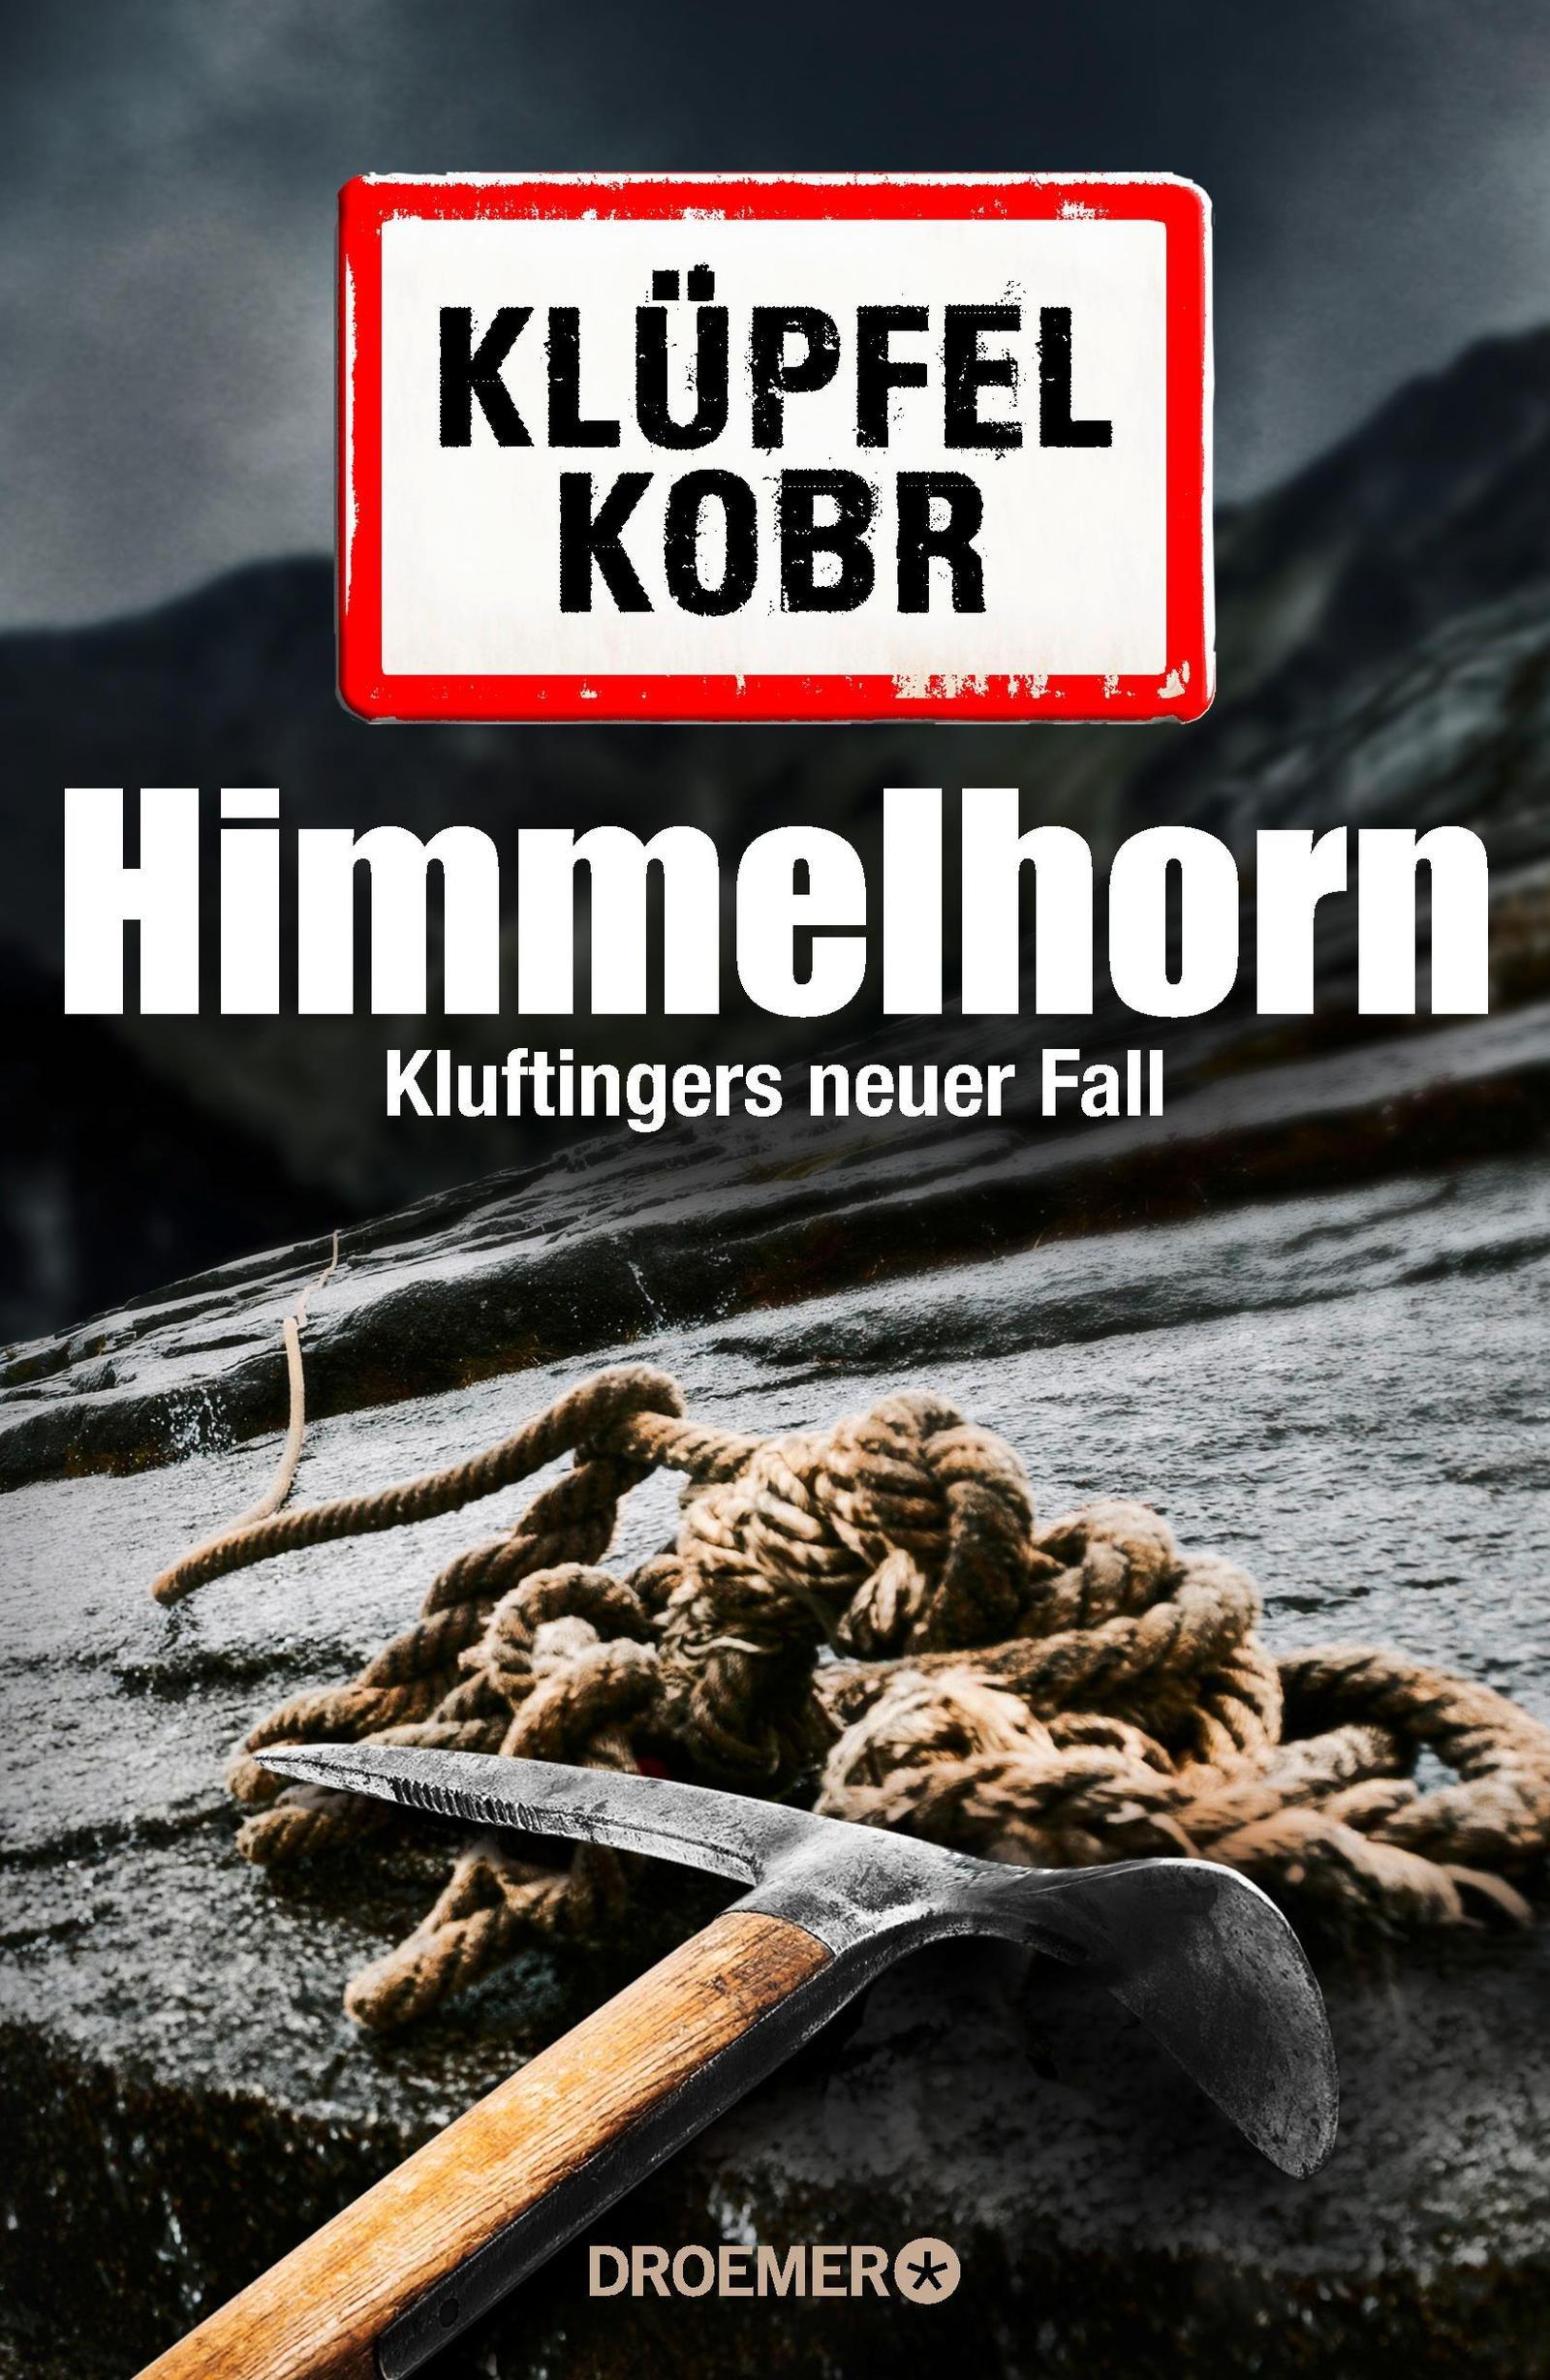 Himmelhorn: Kluftingers neuer Fall - Volker Klüpfel & Michael Kobr